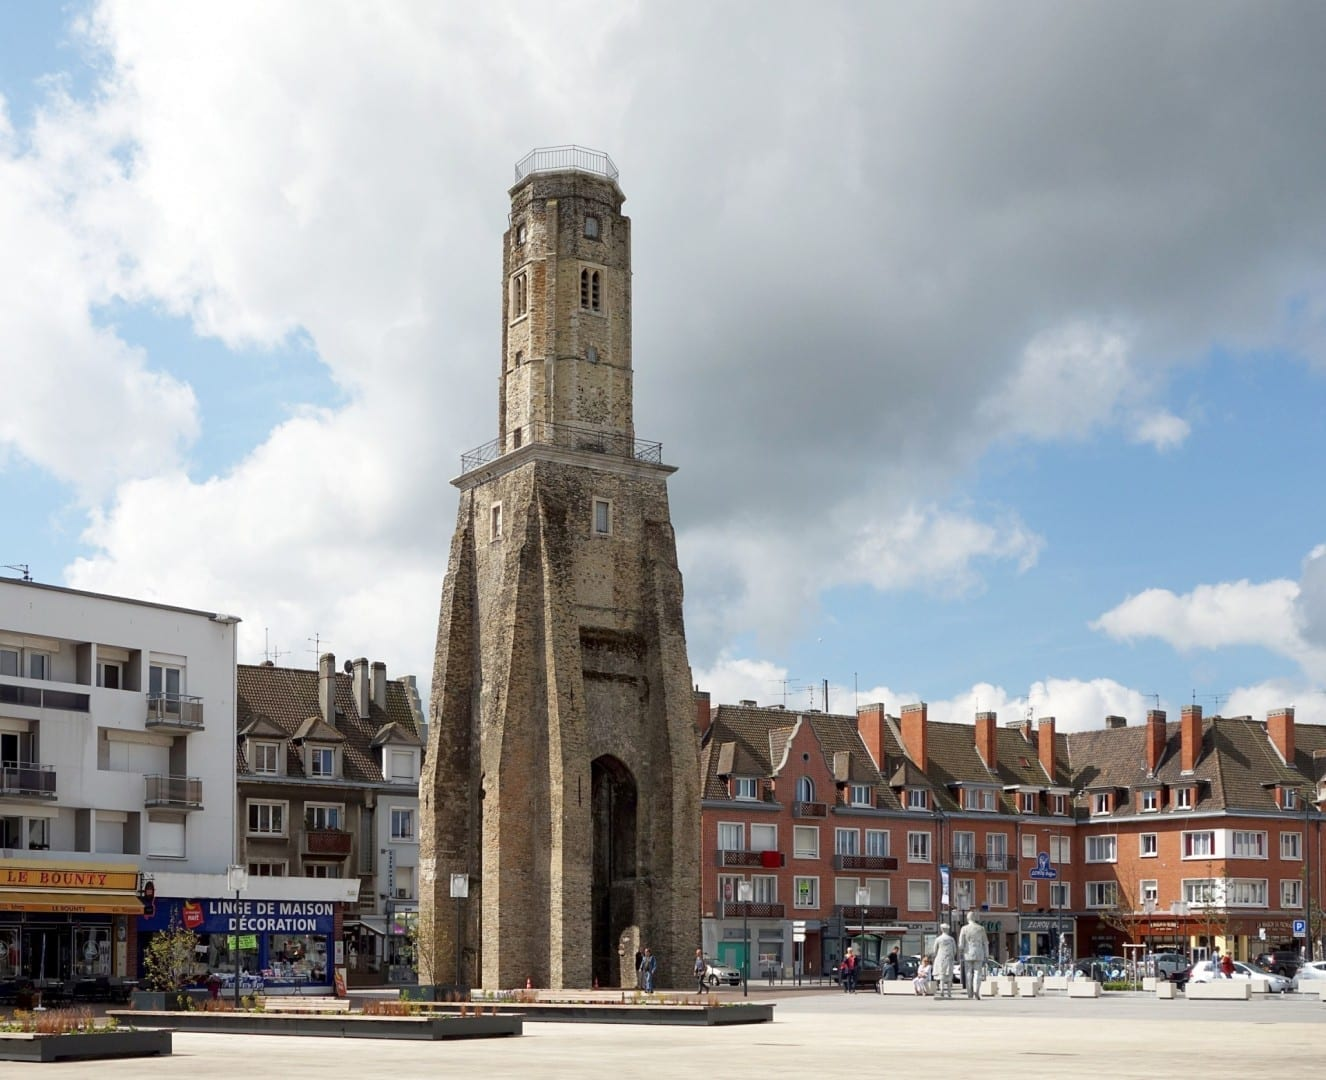 Torre de vigilancia Calais Francia